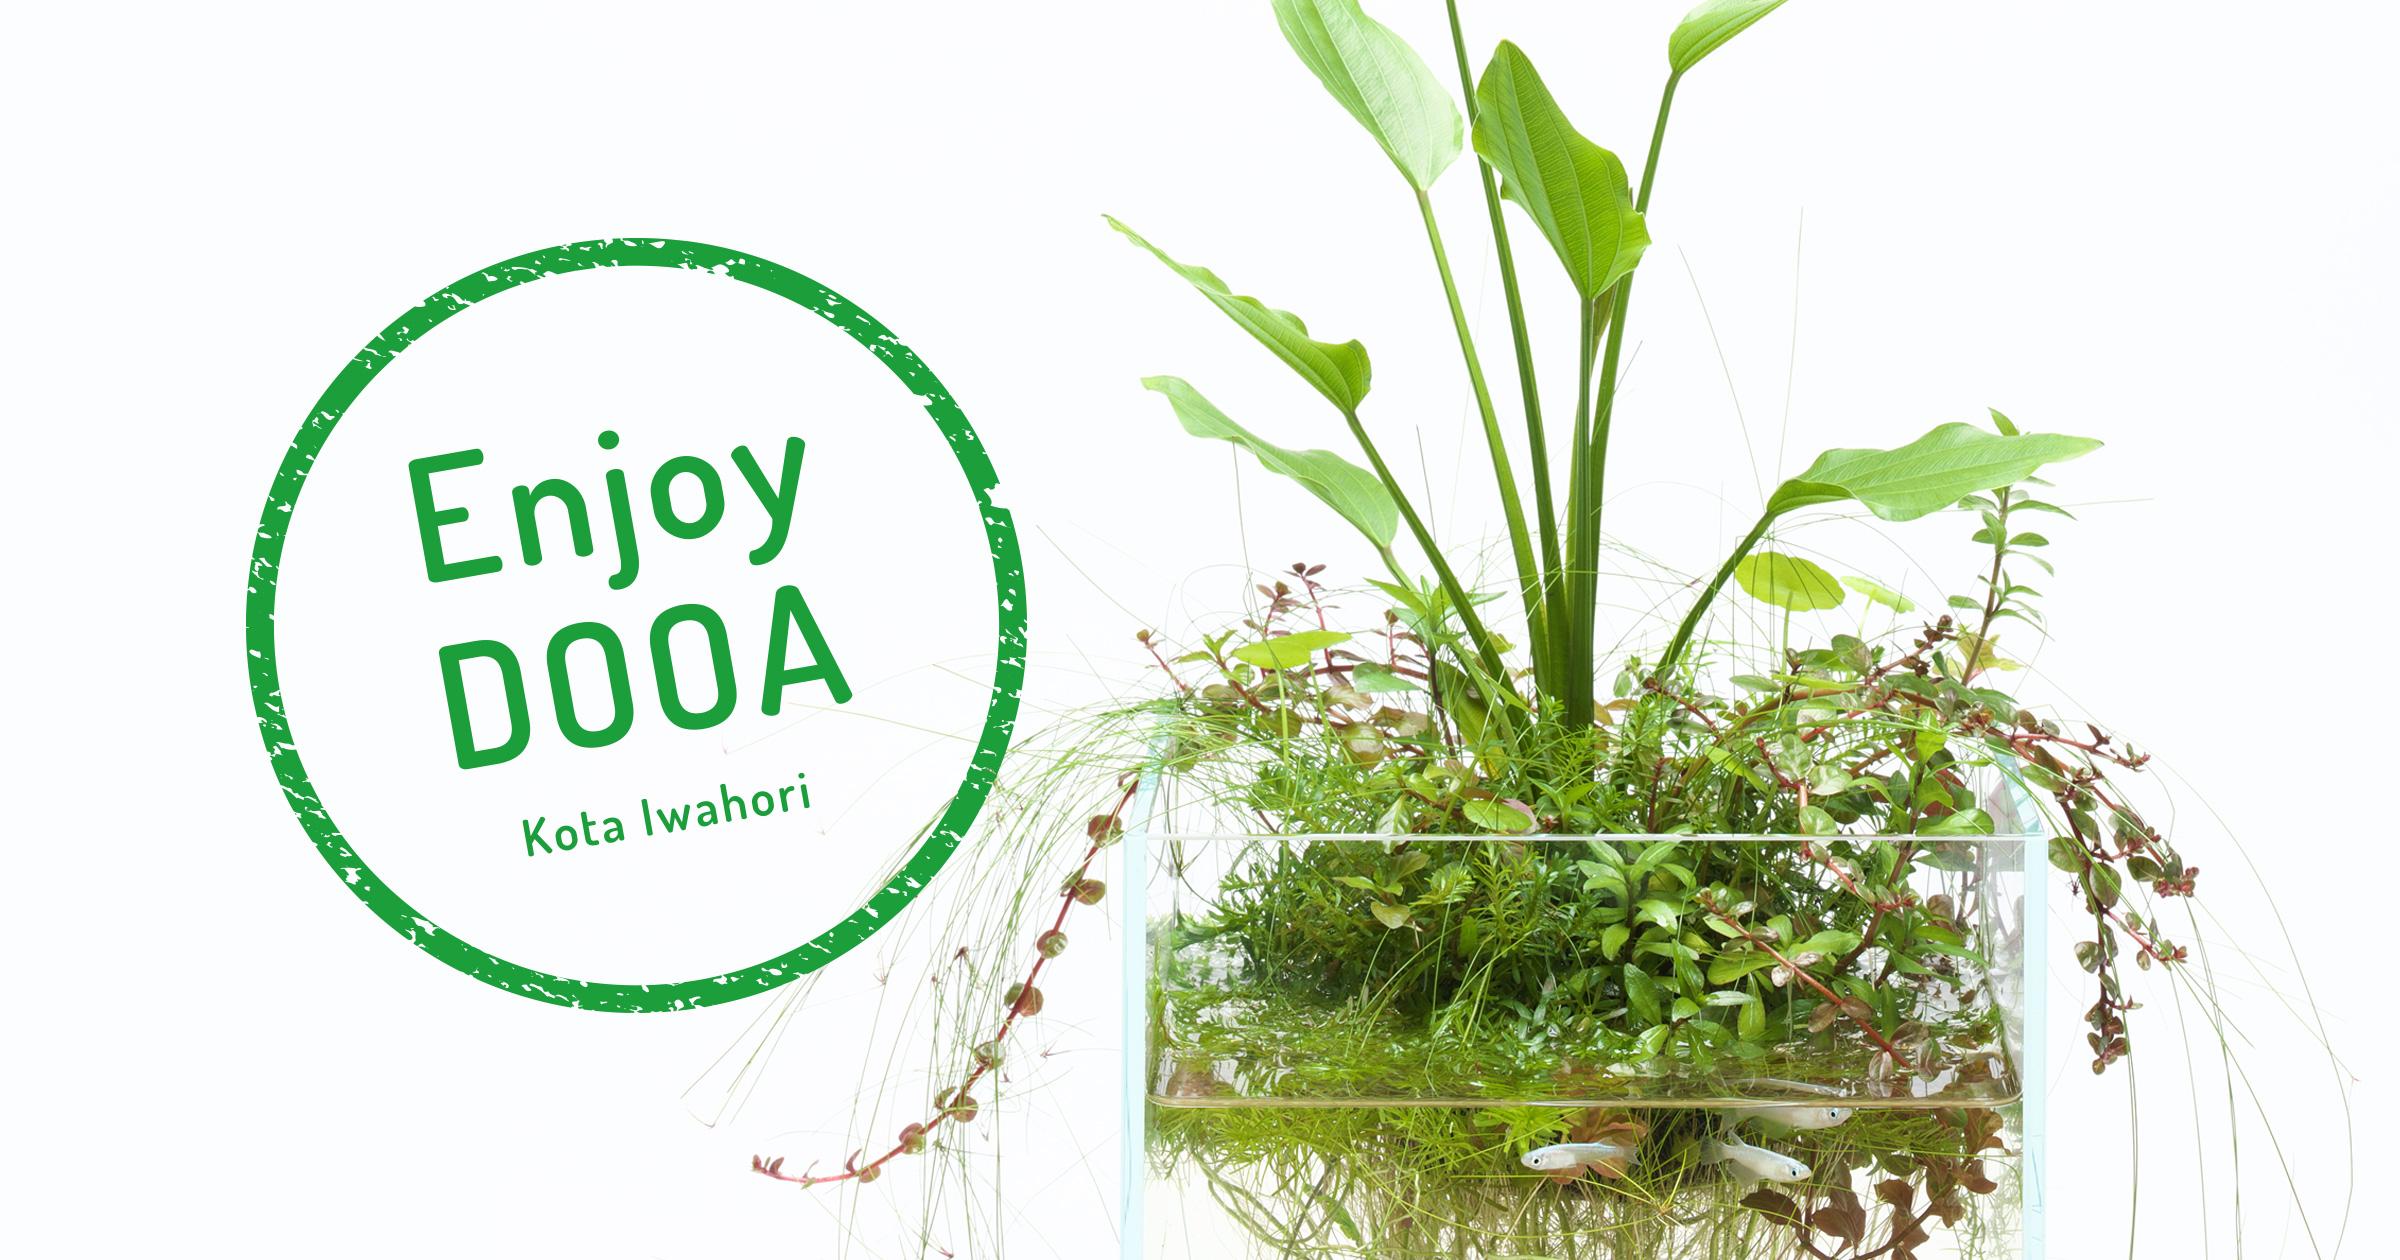 Enjoy DOOA「ネオグラスエアで楽しむエキノドルスの葉姿」